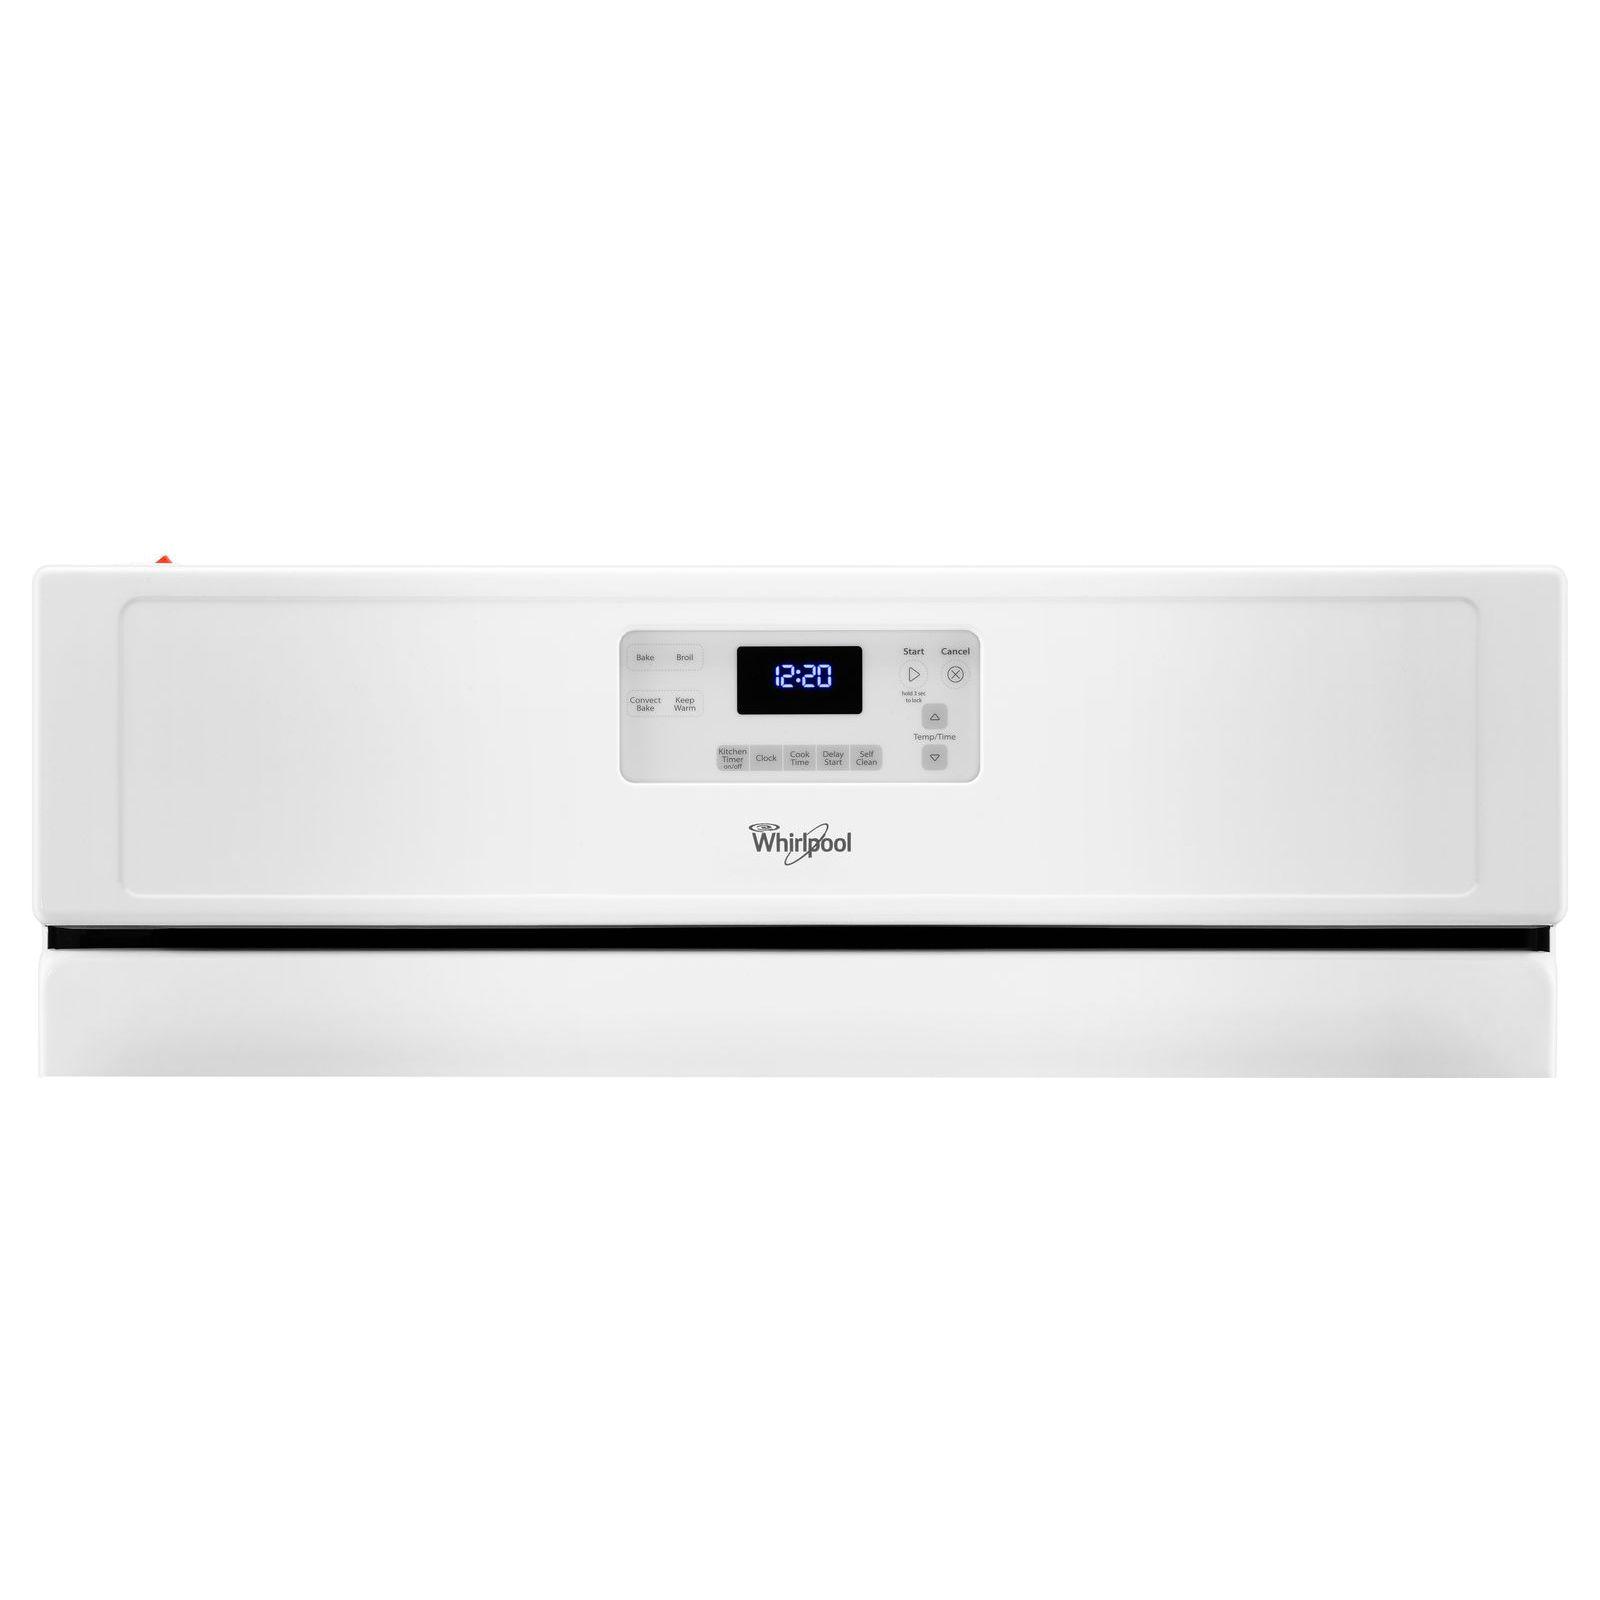 Whirlpool WFG530S0EW 5.0 cu. ft. Freestanding Gas Range - White